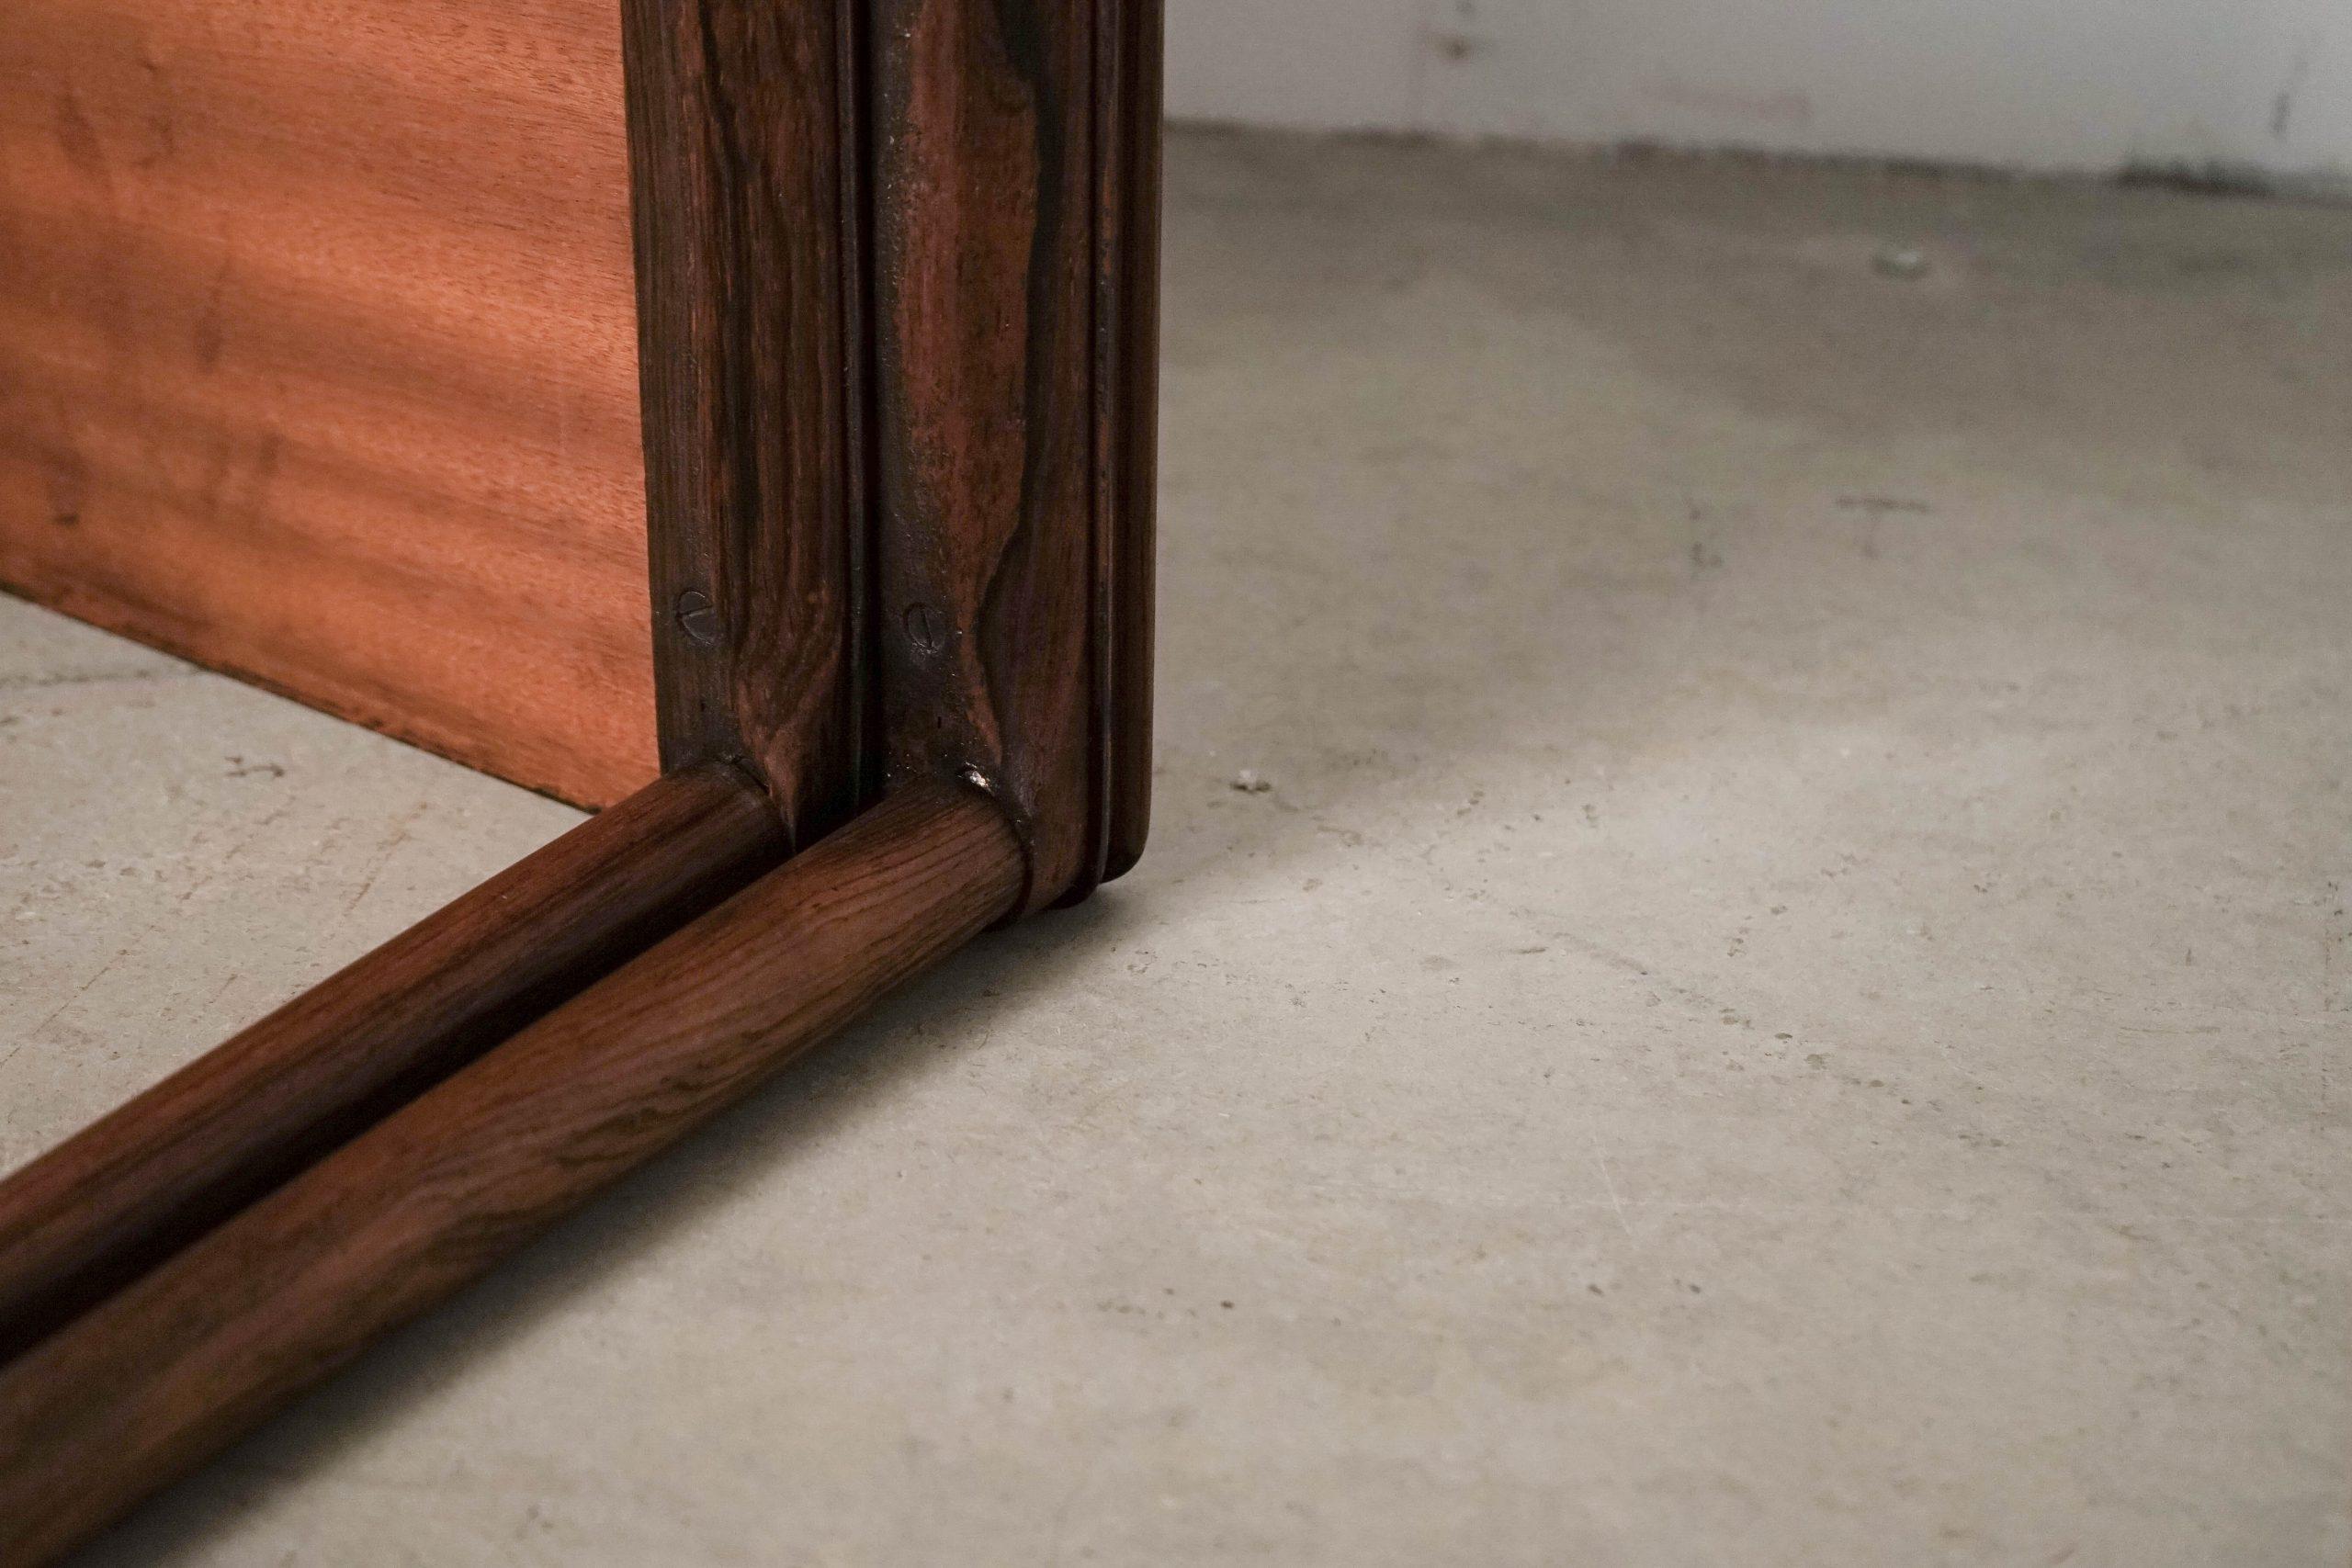 mesa de teca palosanto de madera de calidad hecha a mano ebanista